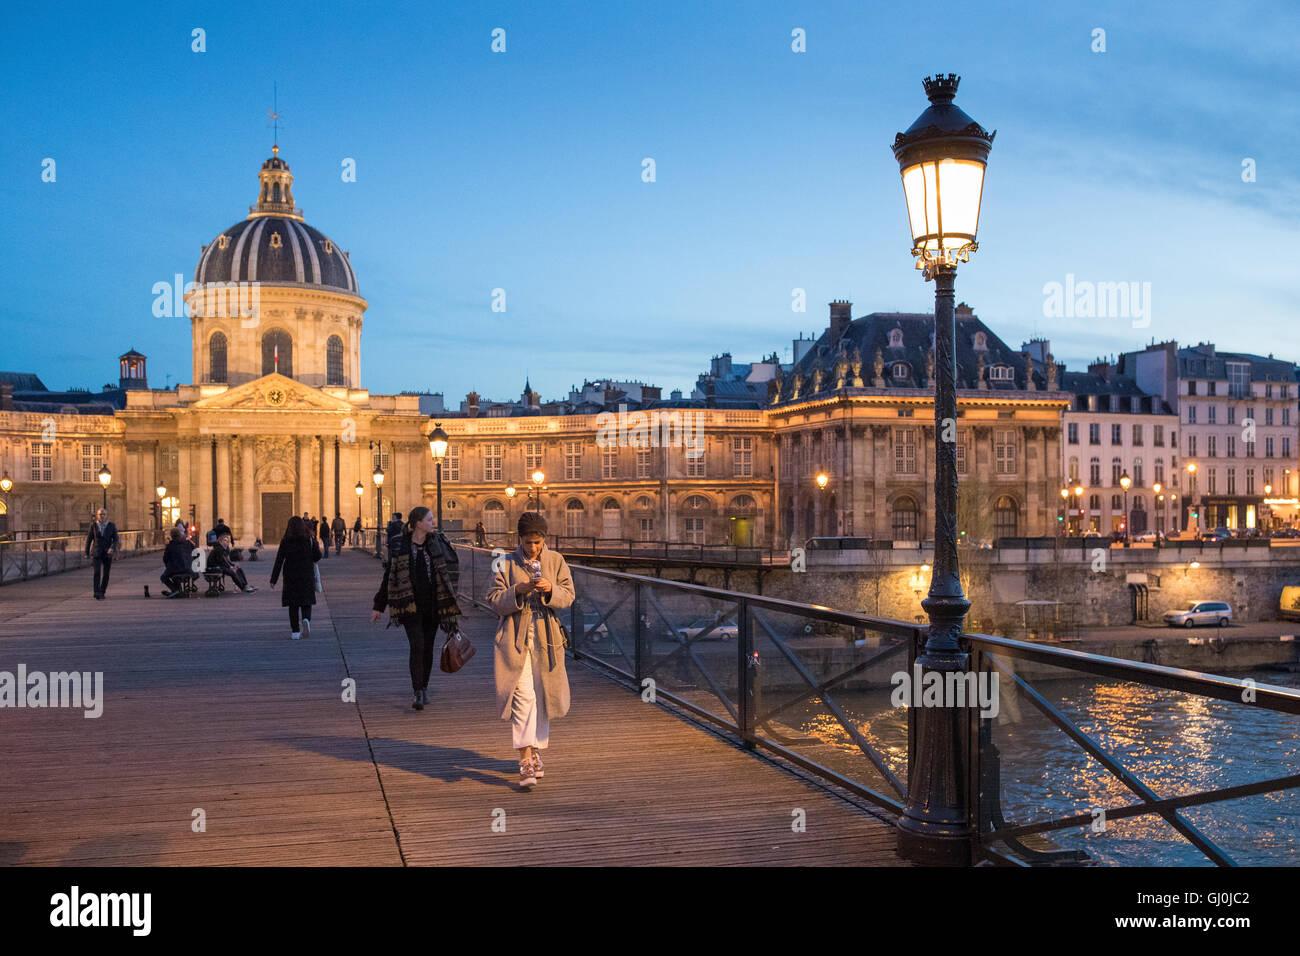 People Walking on the Pont des Arts at dusk, Paris, France - Stock Image